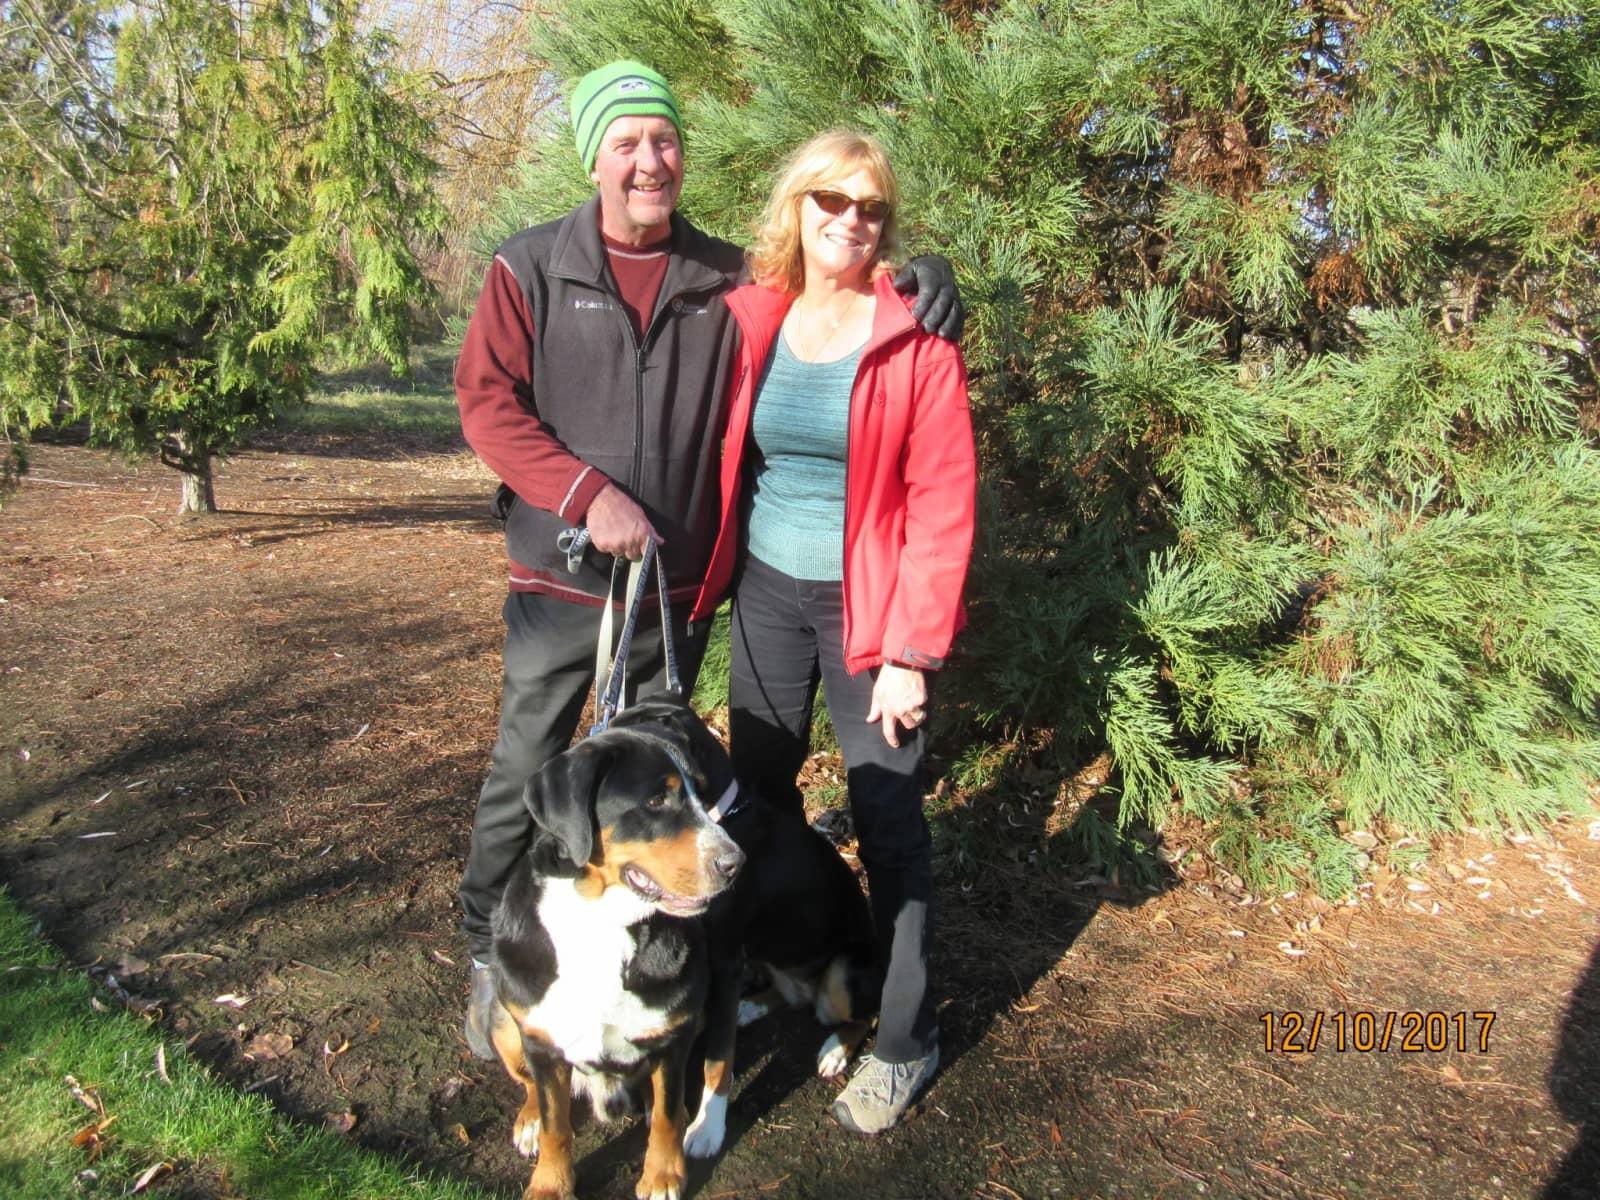 Brian & Jane from North Bend, Washington, United States